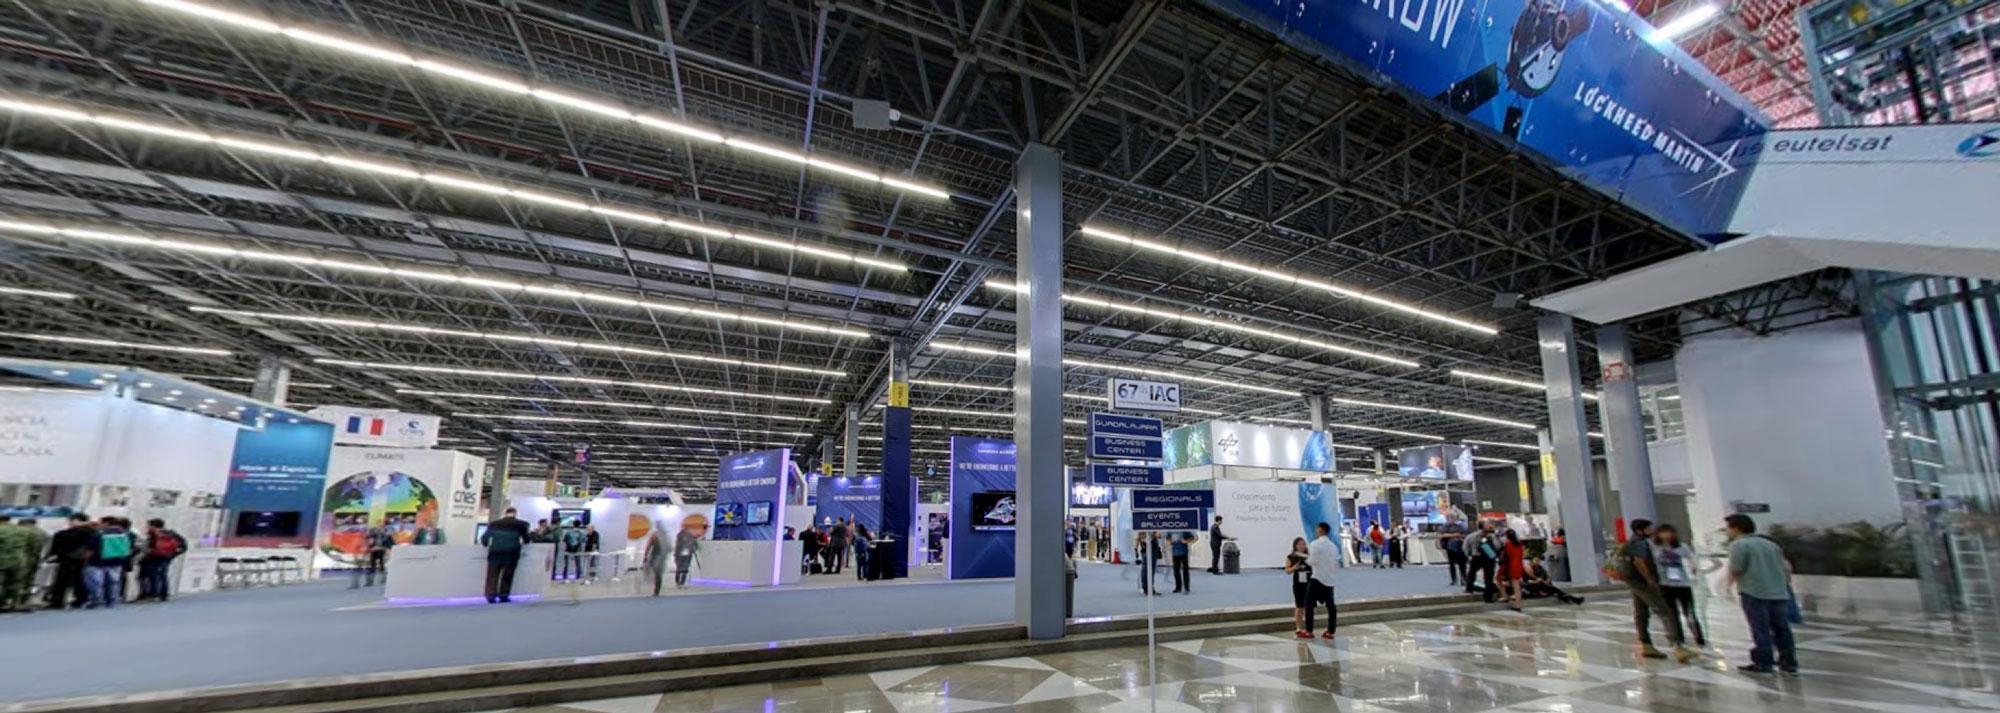 International Astronautical Congress (IAC),   GUADALAJARA, MEXICO